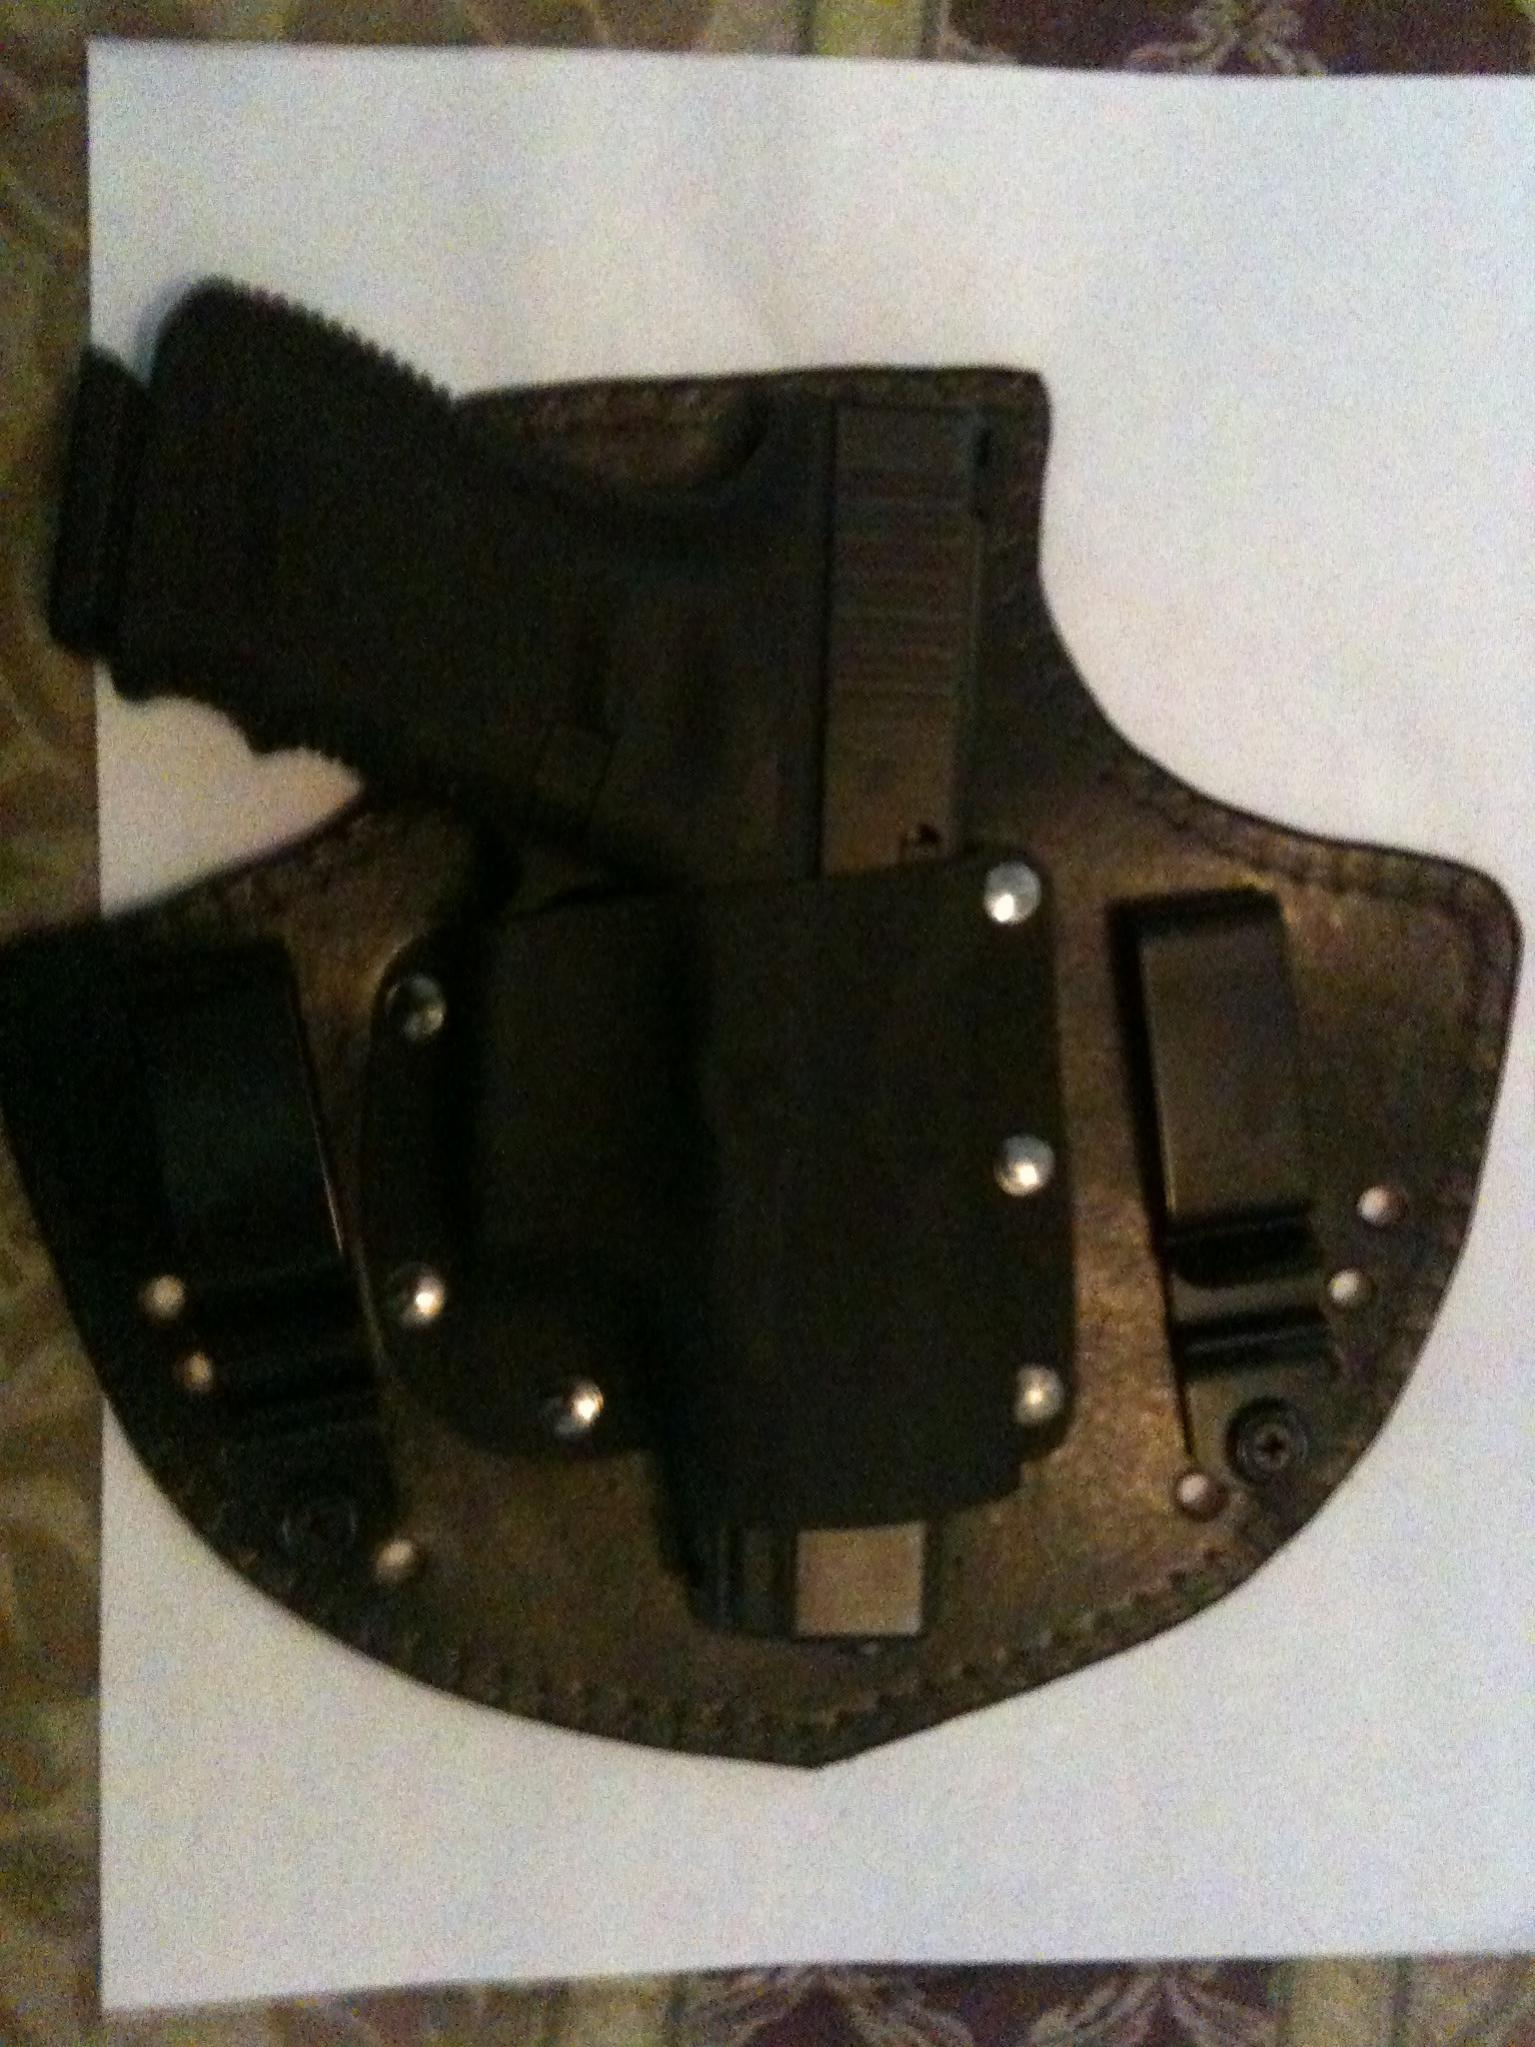 Best IWB for Glock 23 and 27-imageuploadedbytapatalk.jpg